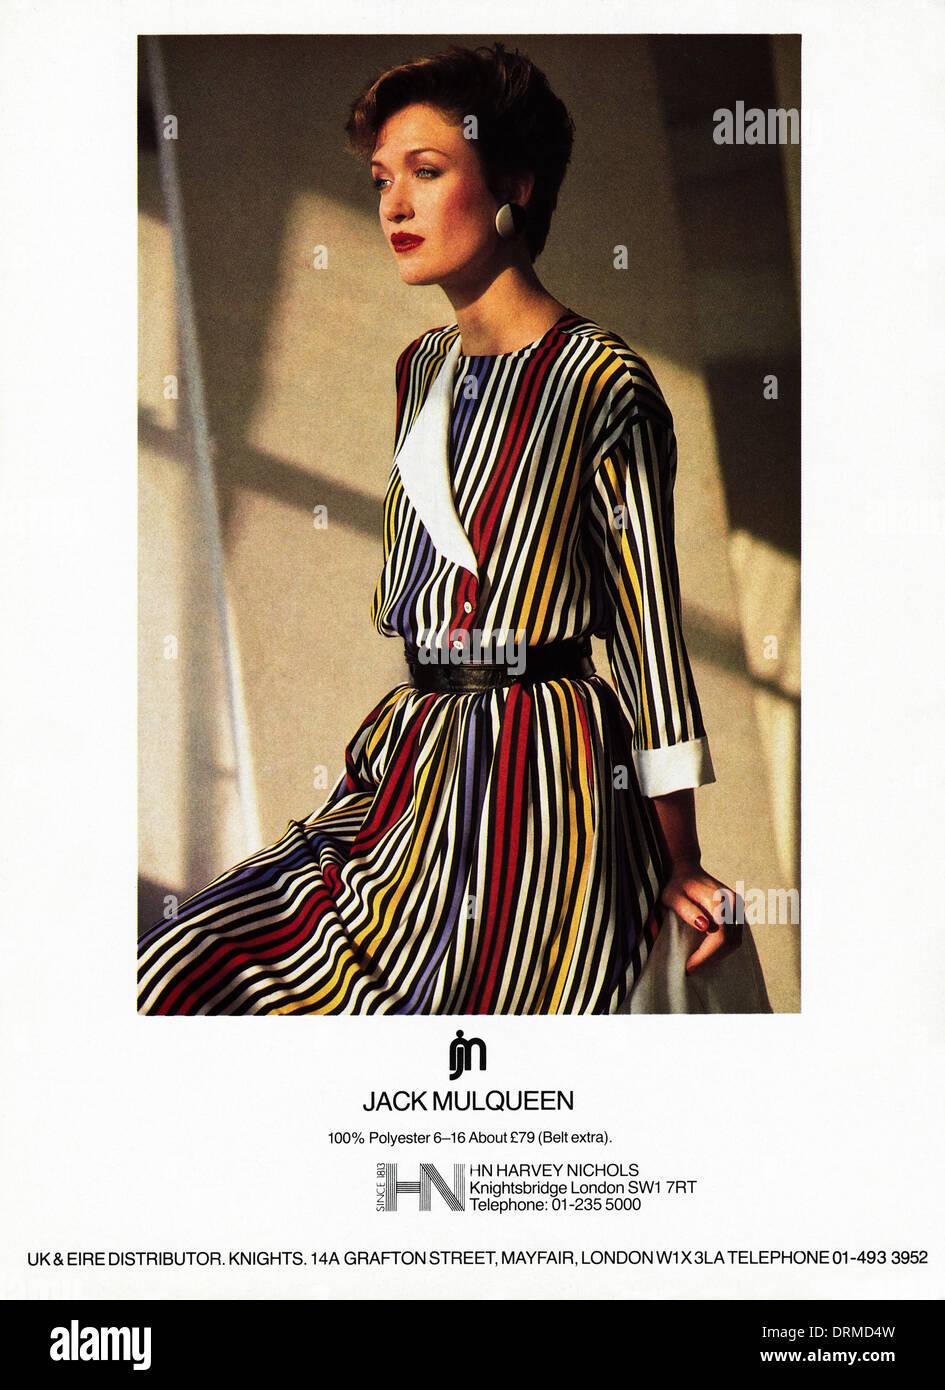 1980s fashion magazine advertisement advertising JACK MULQUEEN fashions, advert circa 1983 - Stock Image